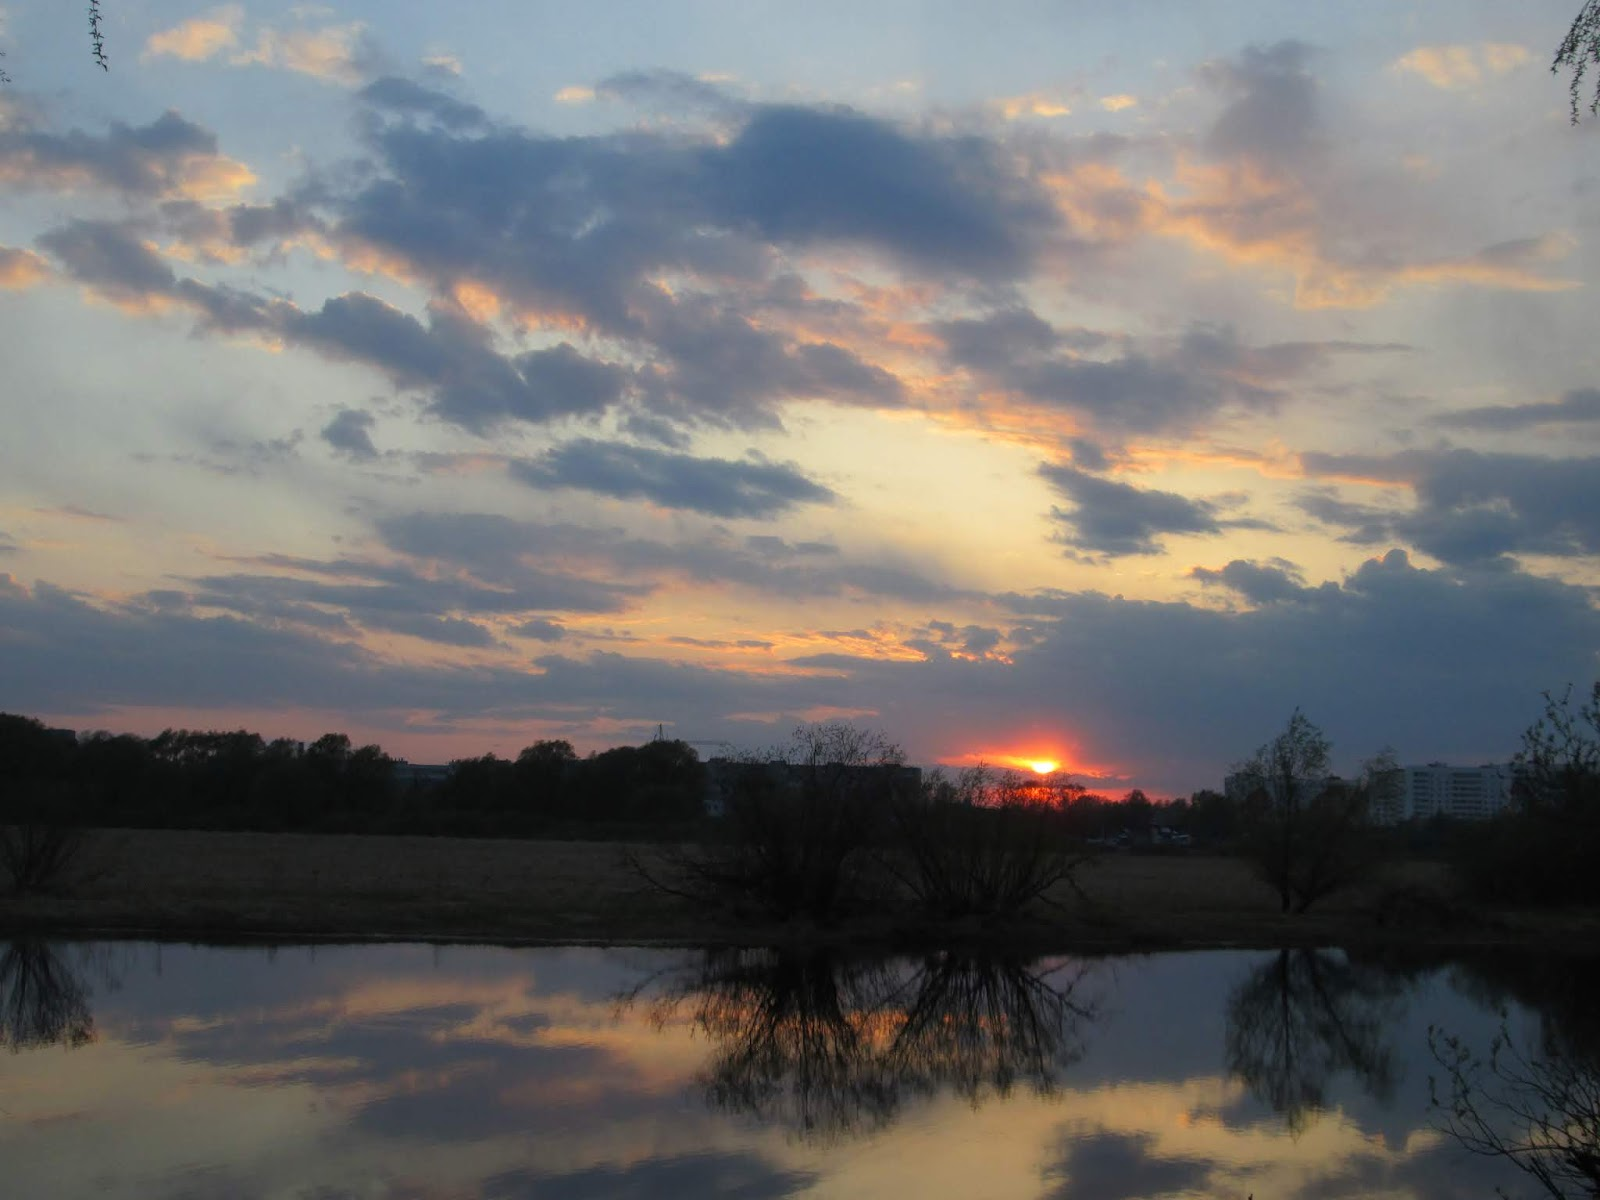 Красный вечерний закат солнца над рекой